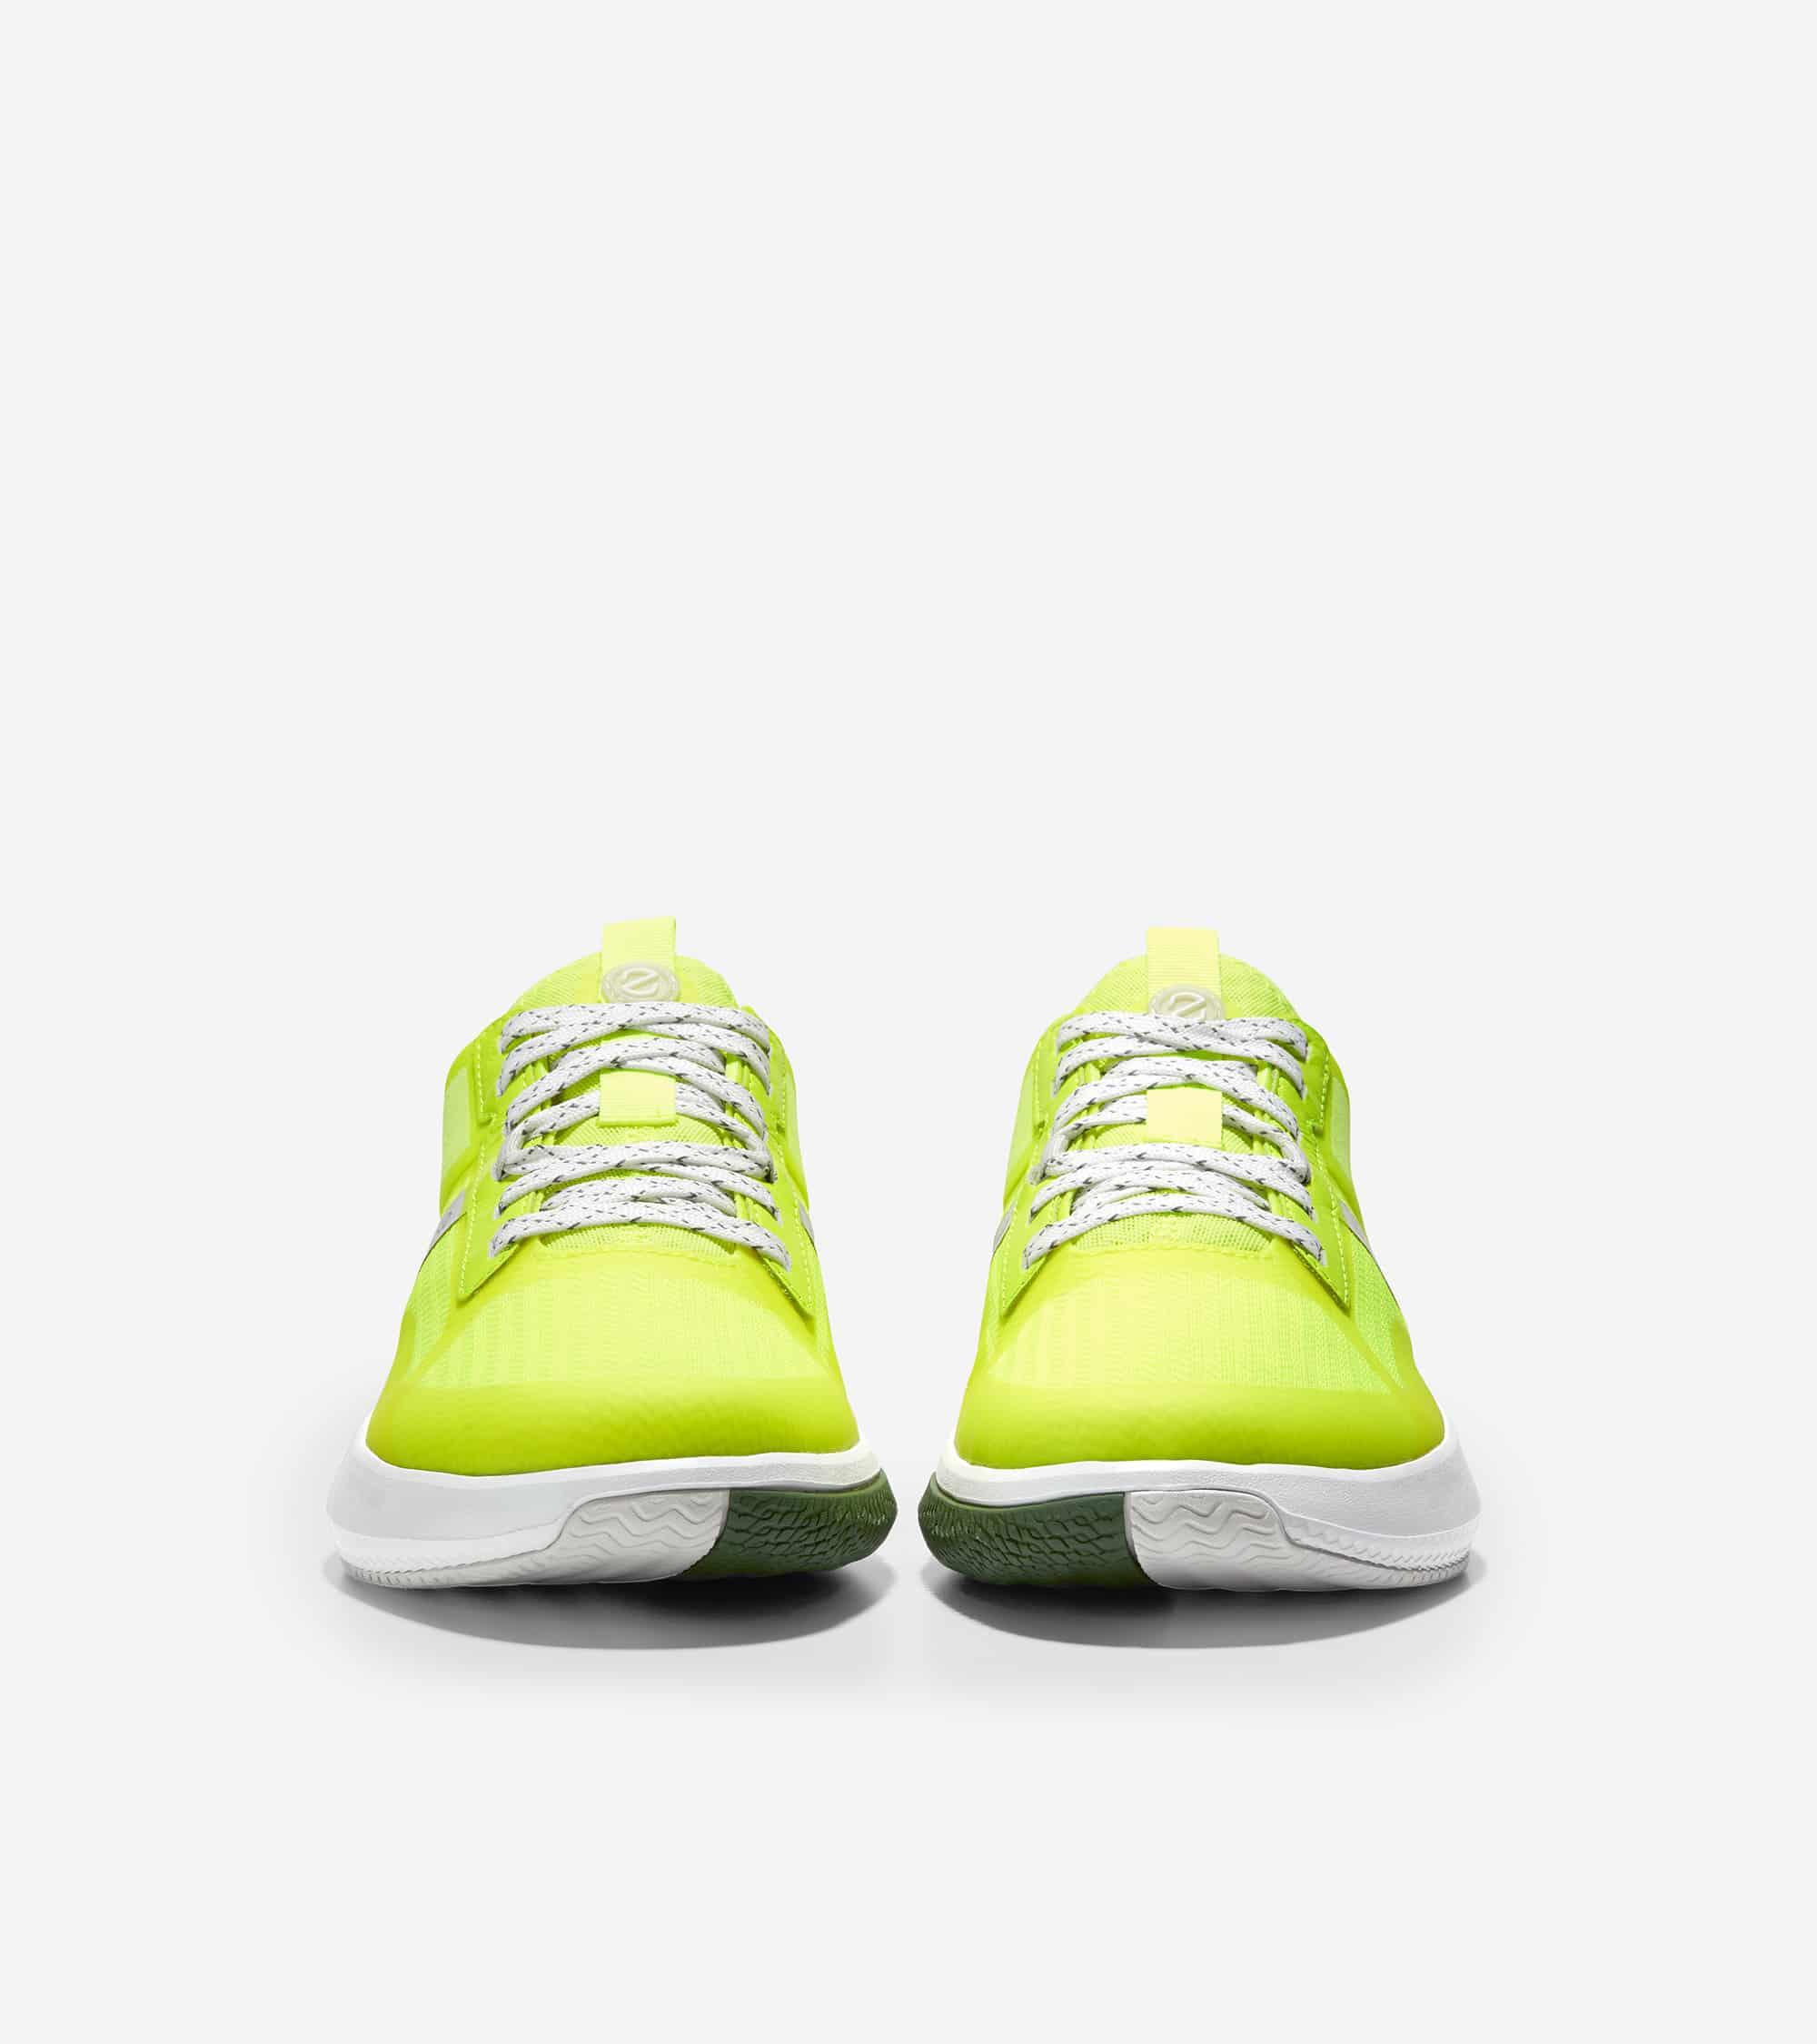 Cole Haan ZERØGRAND Winner Tennis Sneaker Safety Yellow/Nimbus Cloud/Optic White